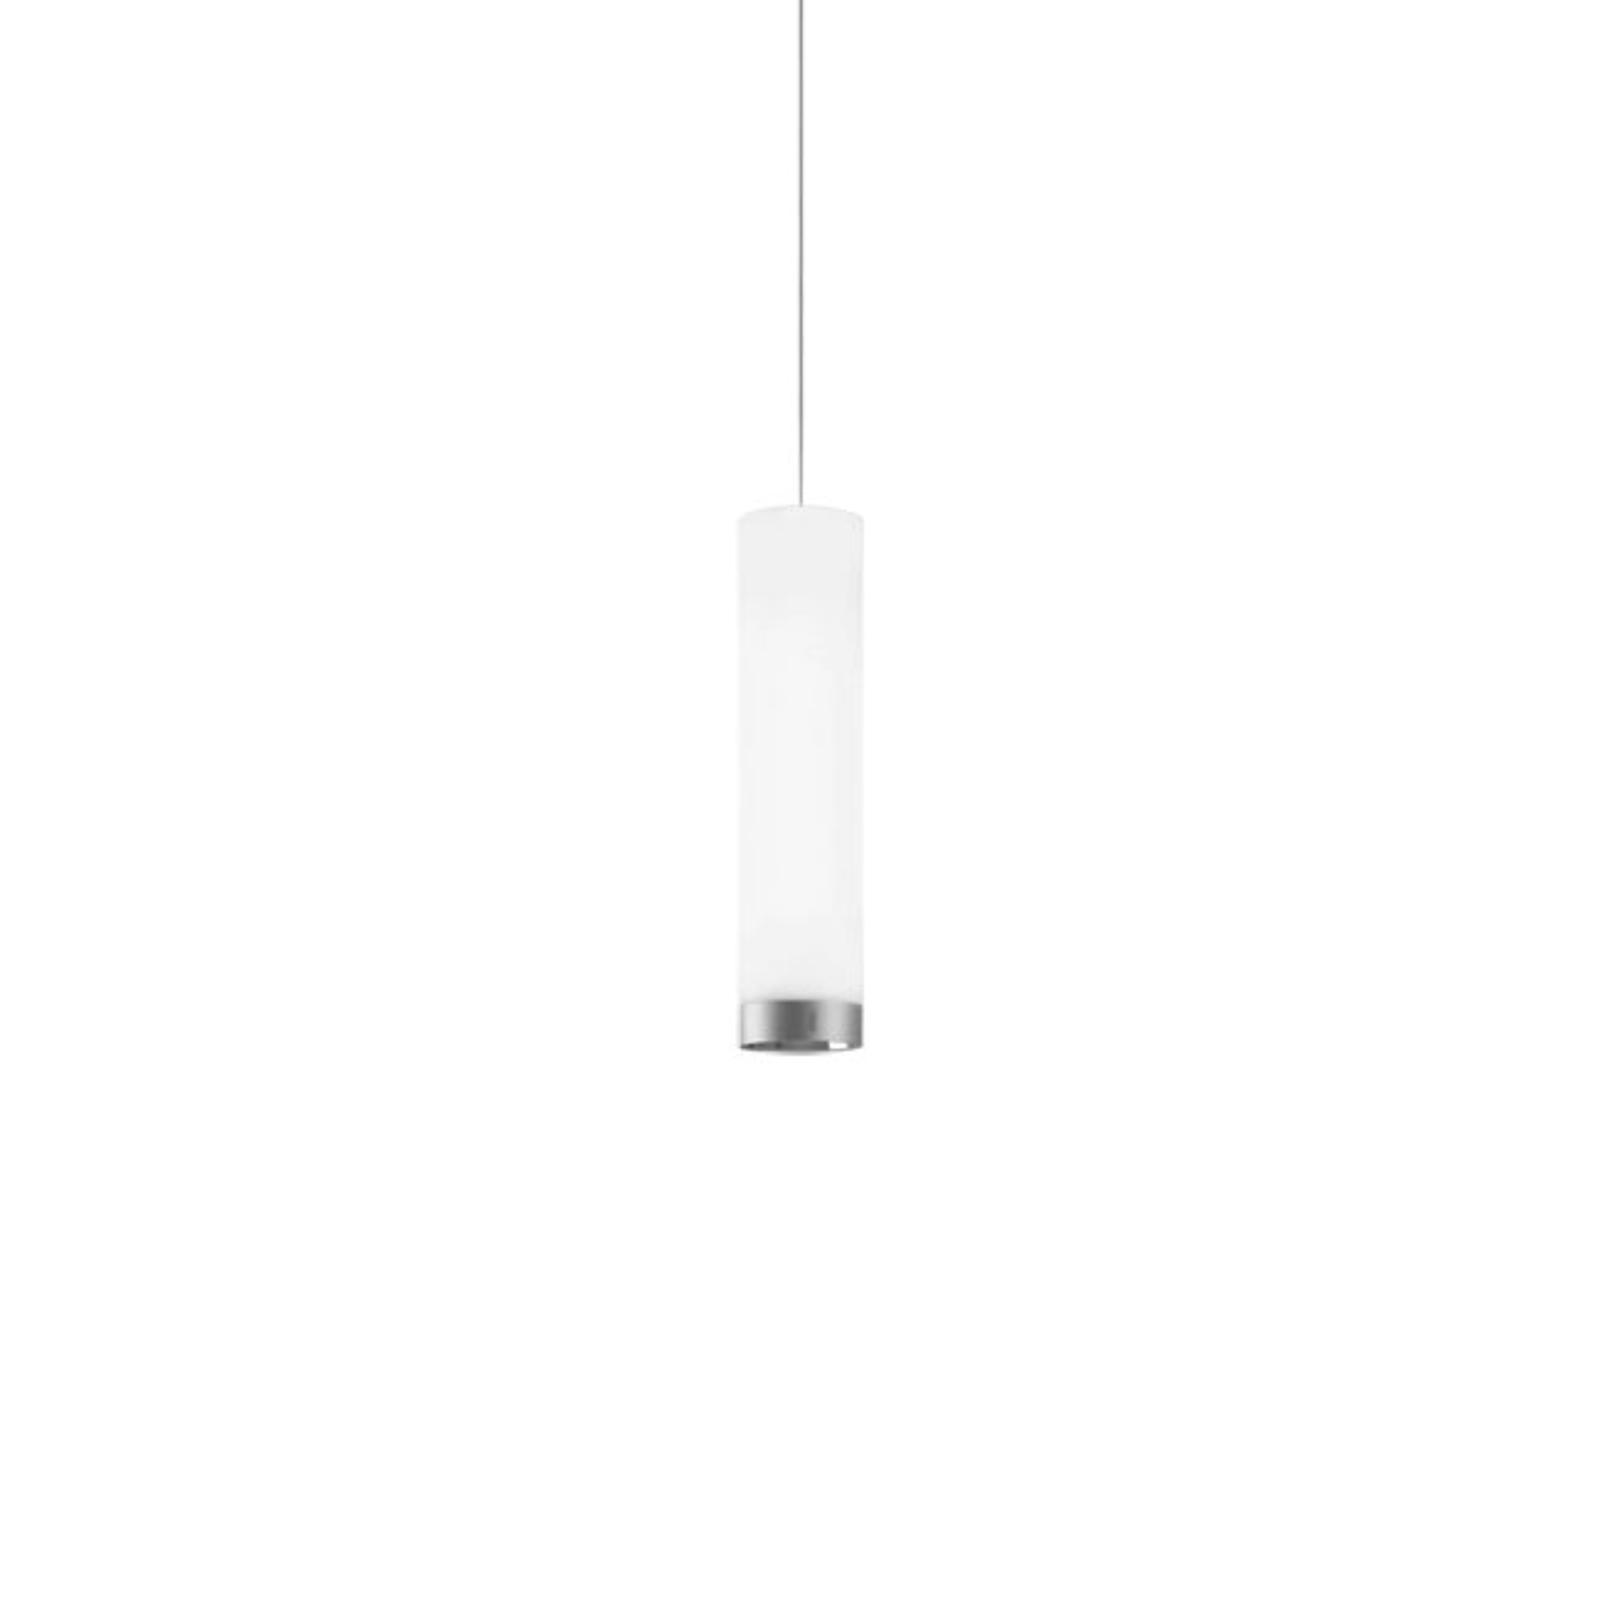 LED hanglamp A20-P166, 67,5 cm, 18W, 3.000K